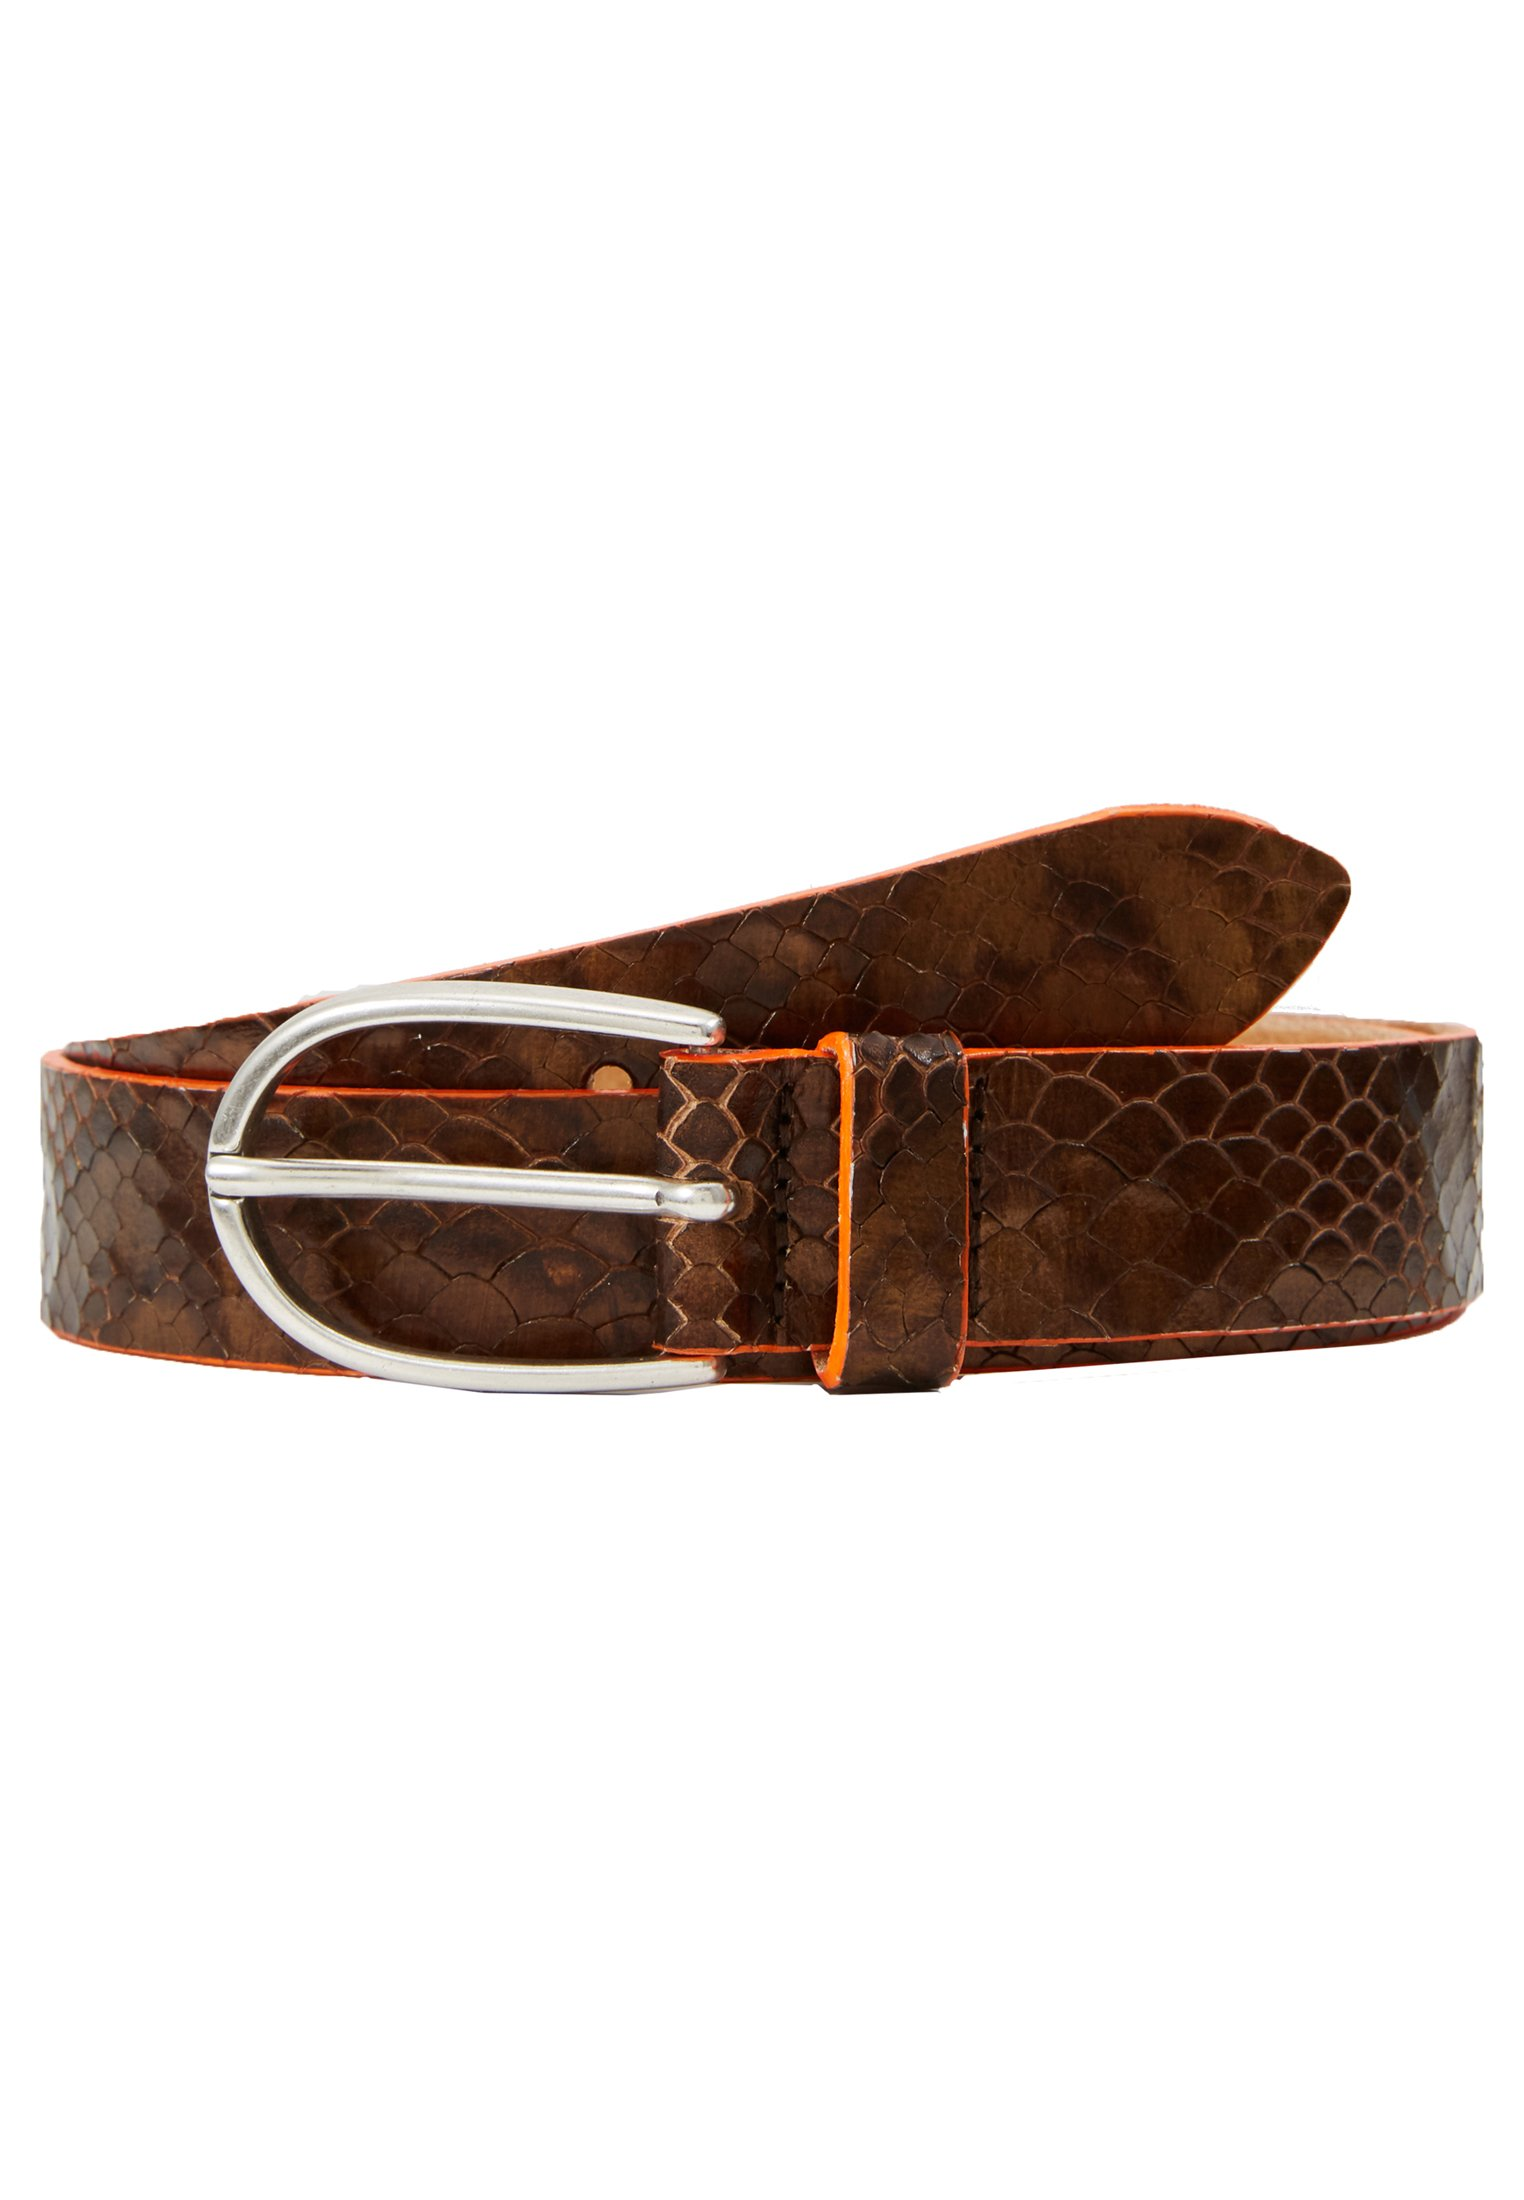 Vanzetti Belte - braun/orange/brun 1n6J7tscpAEYEtD